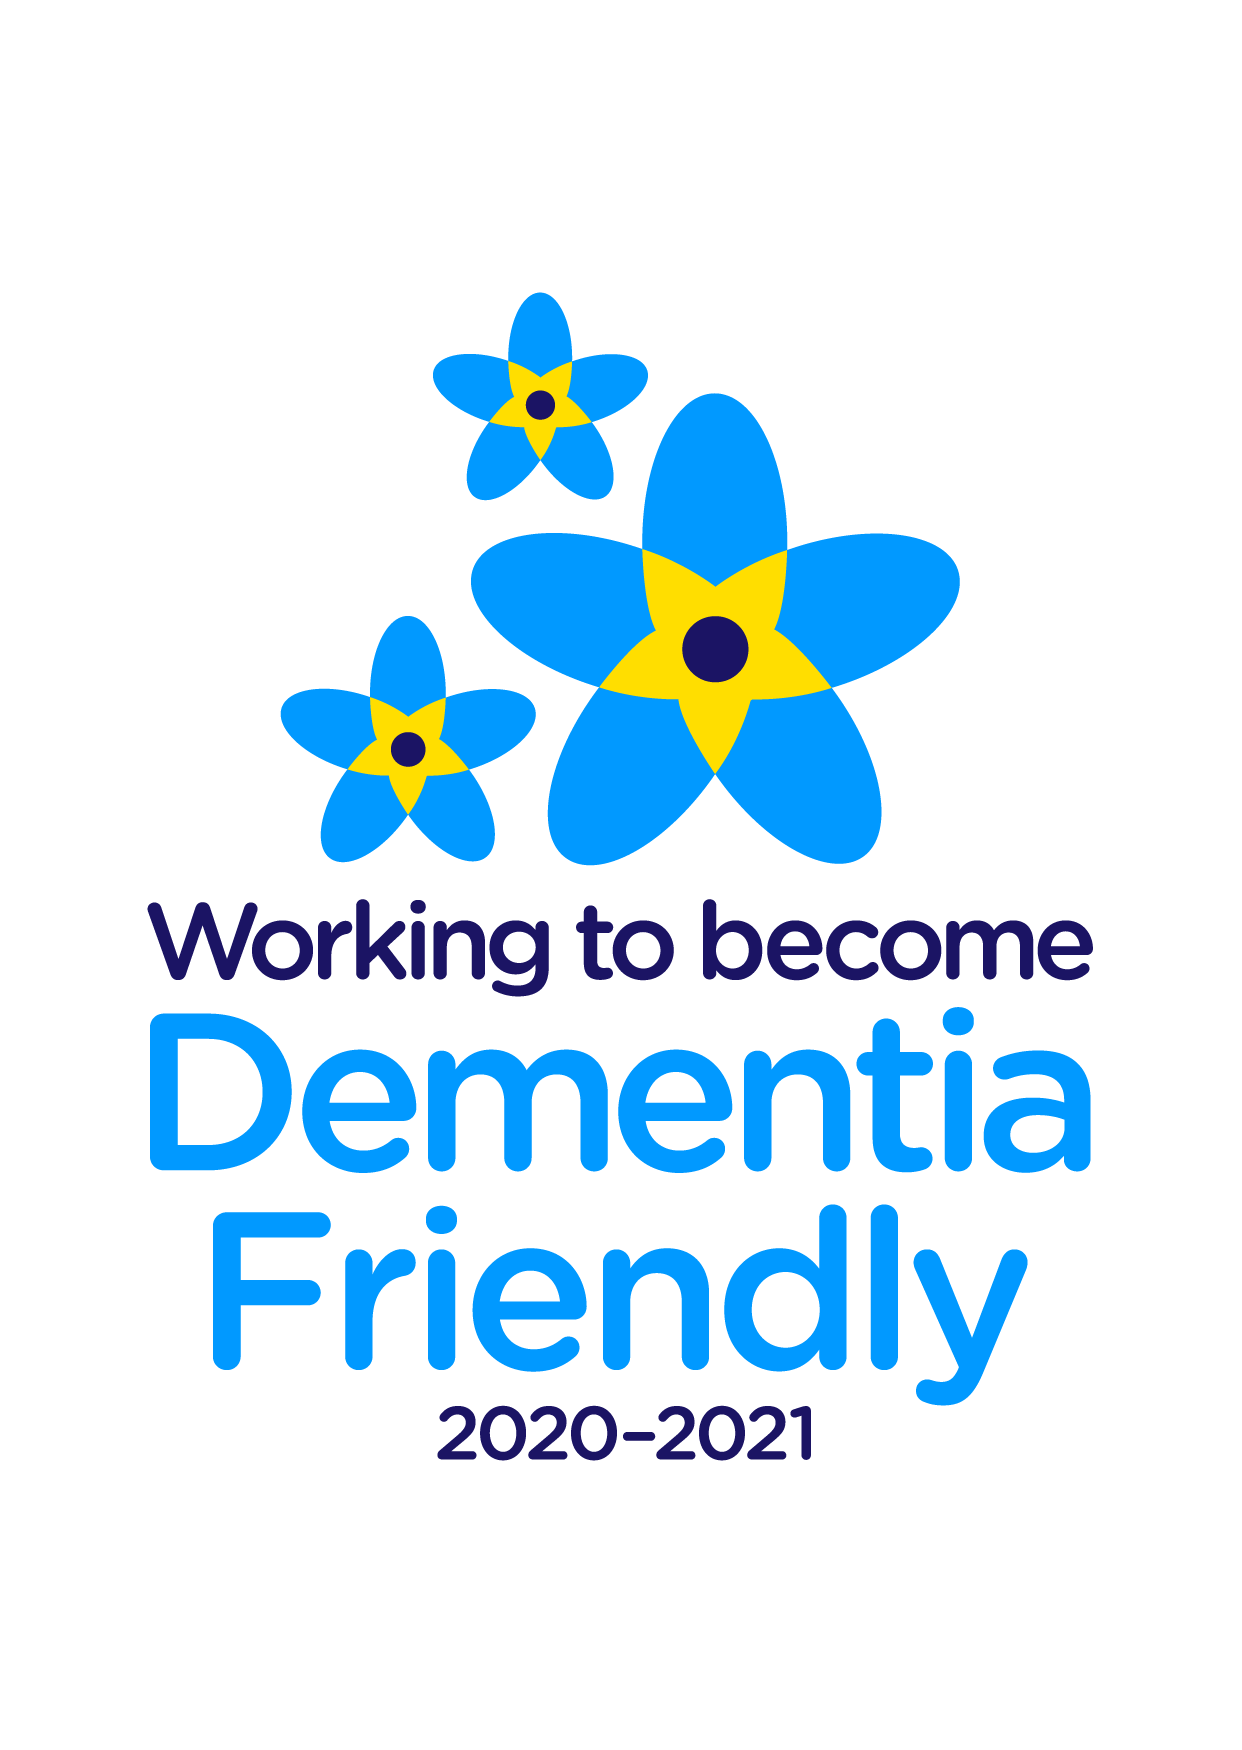 Dementia Friendly Logo 2020 2021